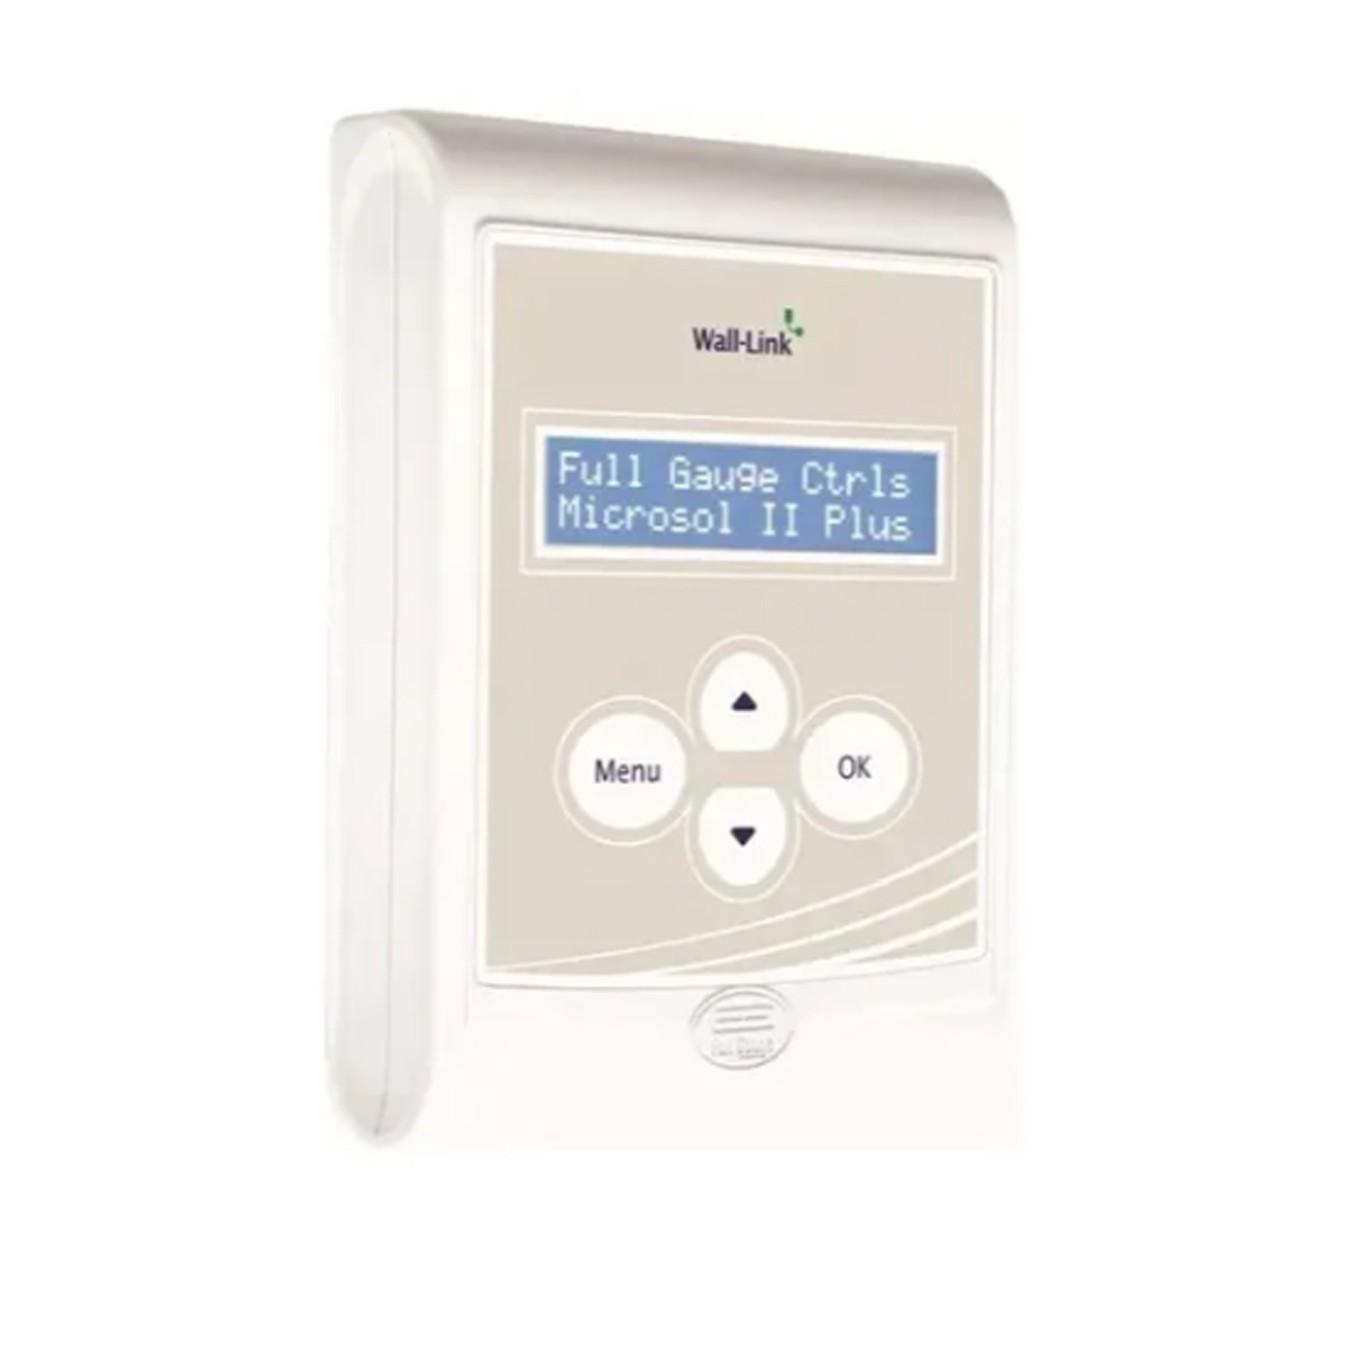 Interface Full Gauge Wall-link P/ Microsol 2 Power E Plus